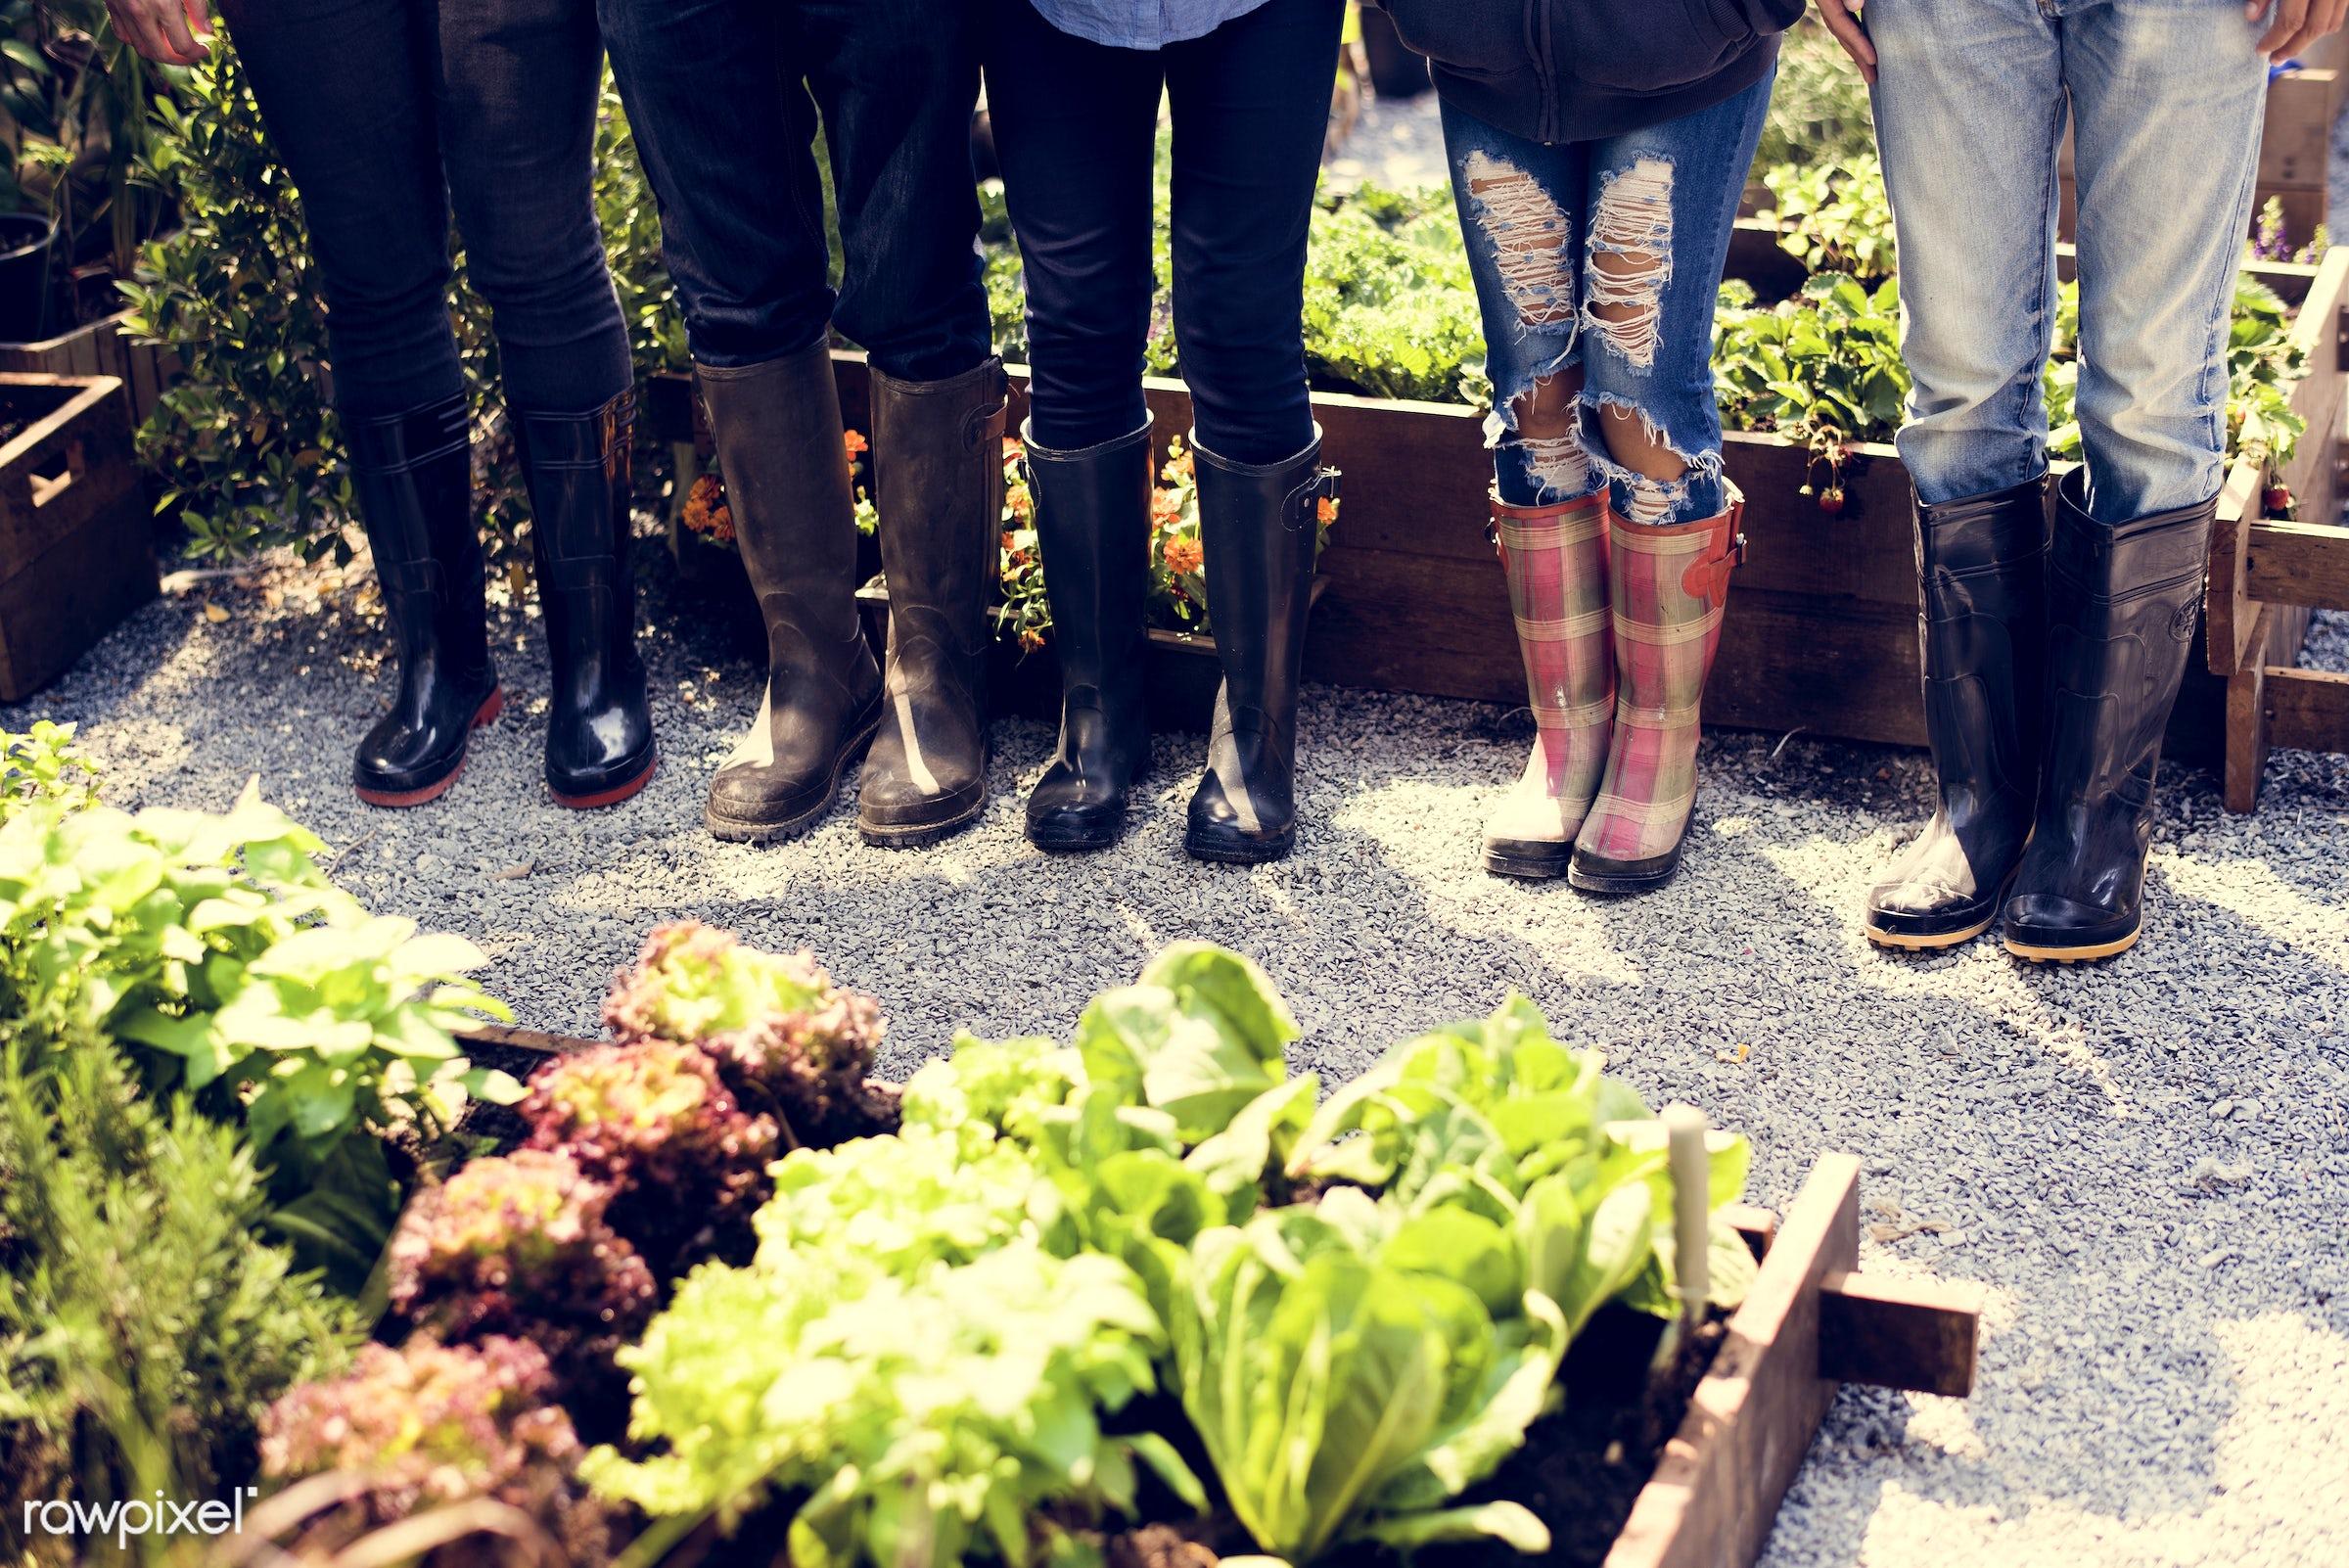 plant, body, nutritious, greenhouse, friends, human leg, farmer, fresh, lettuce, healthy eating, friendship, men, support,...